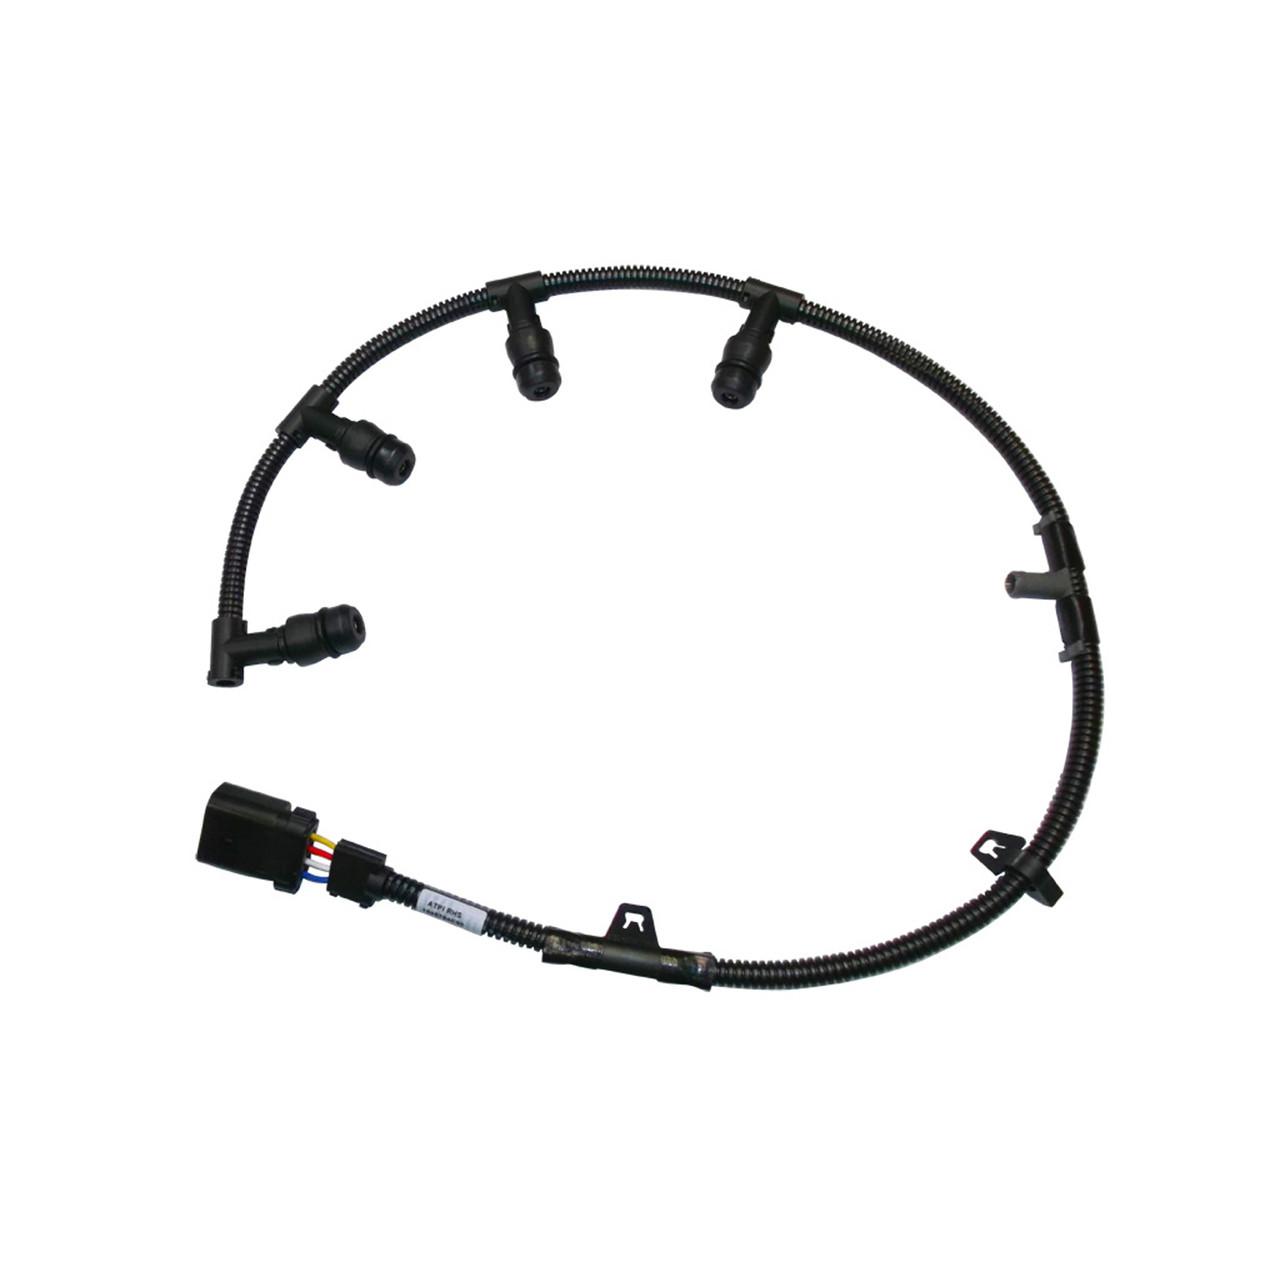 ford 6 0l glow plug harness passenger side wh02961 sku wh02961 upc 613111101032 [ 1280 x 1280 Pixel ]